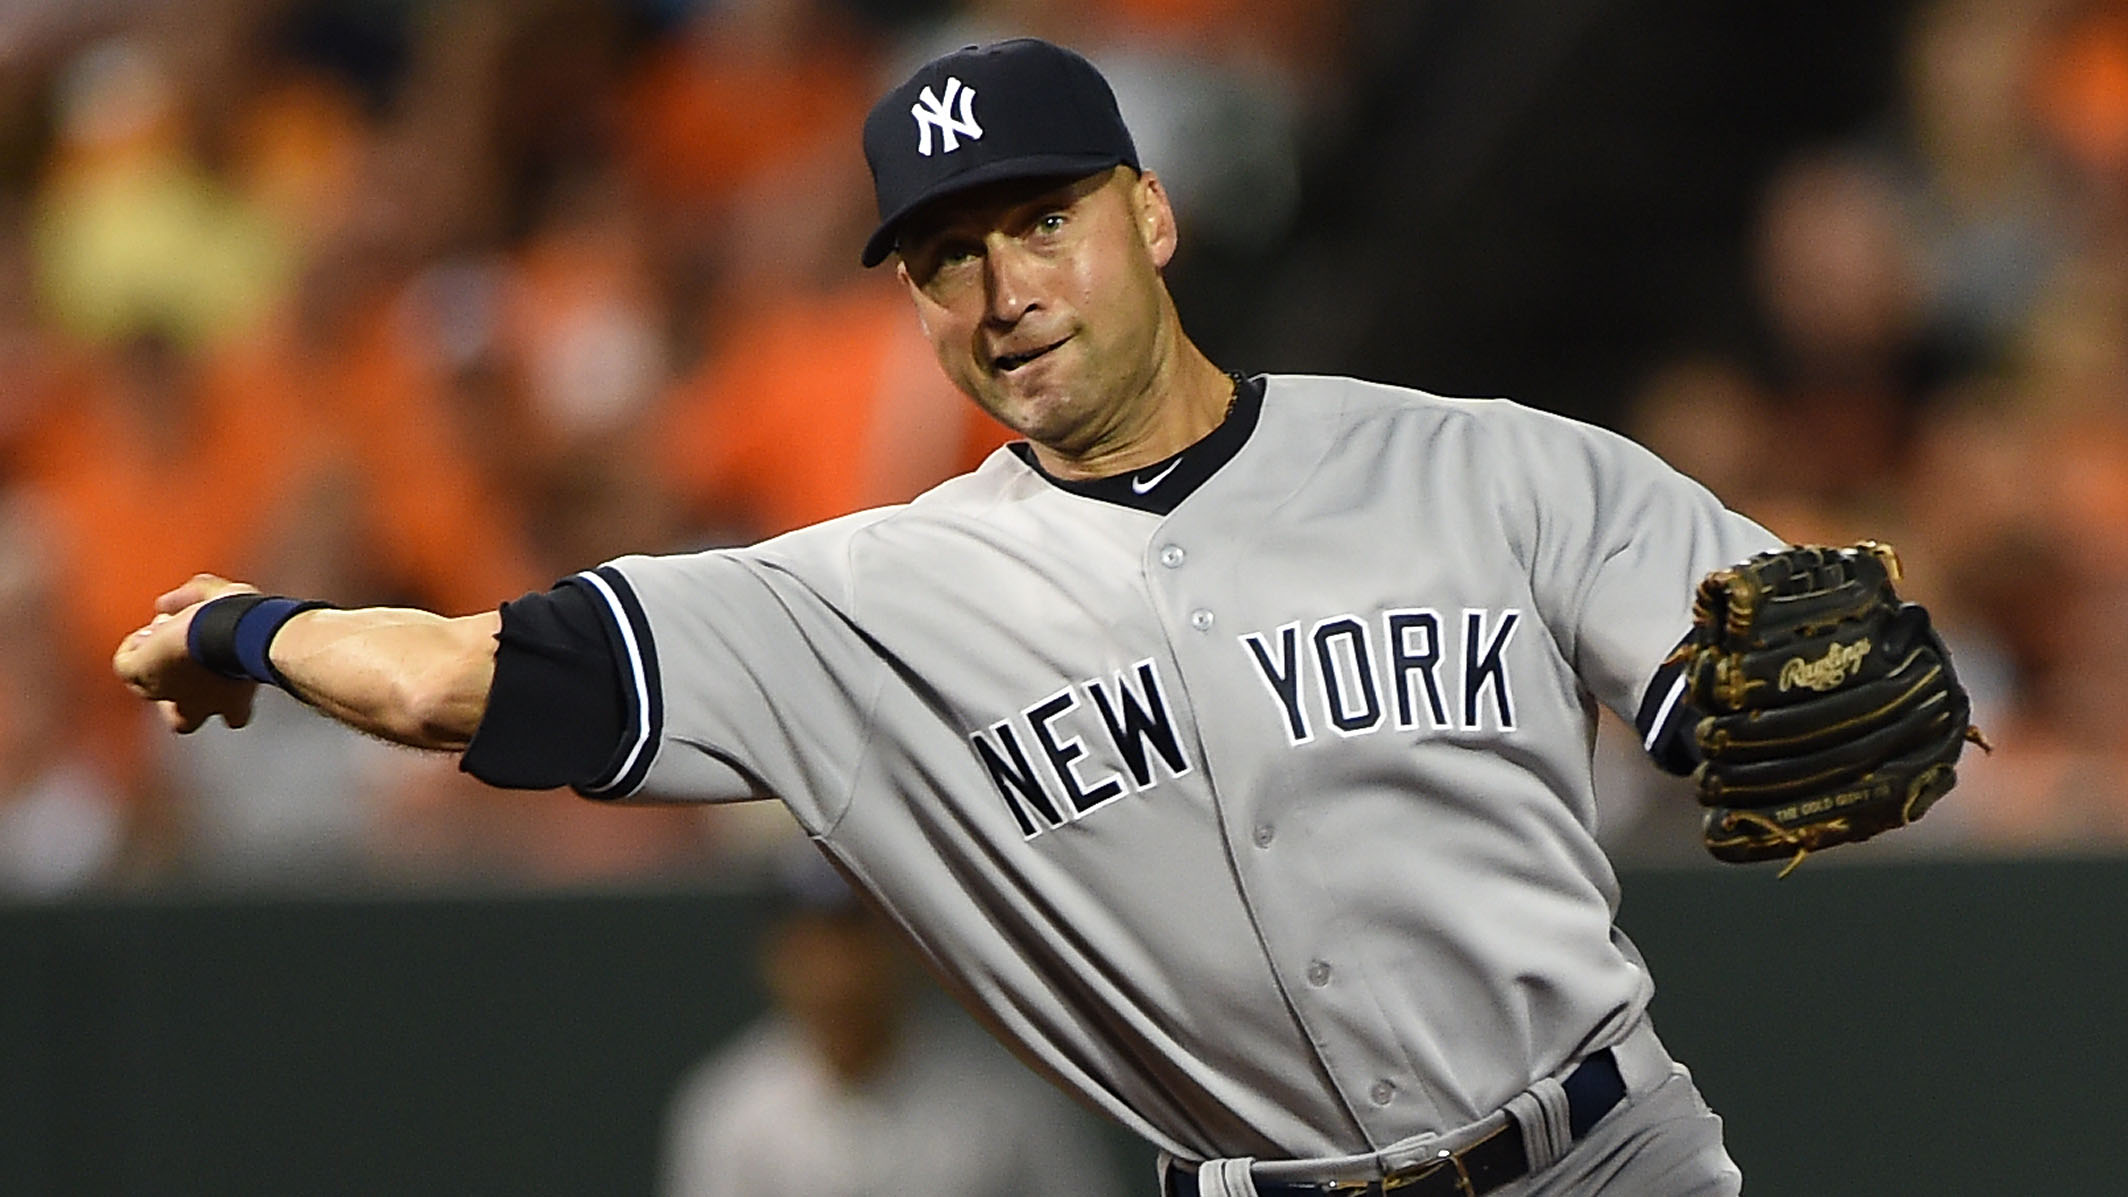 Bryce Harper New York Yankees Derek Jeter is captain of all of